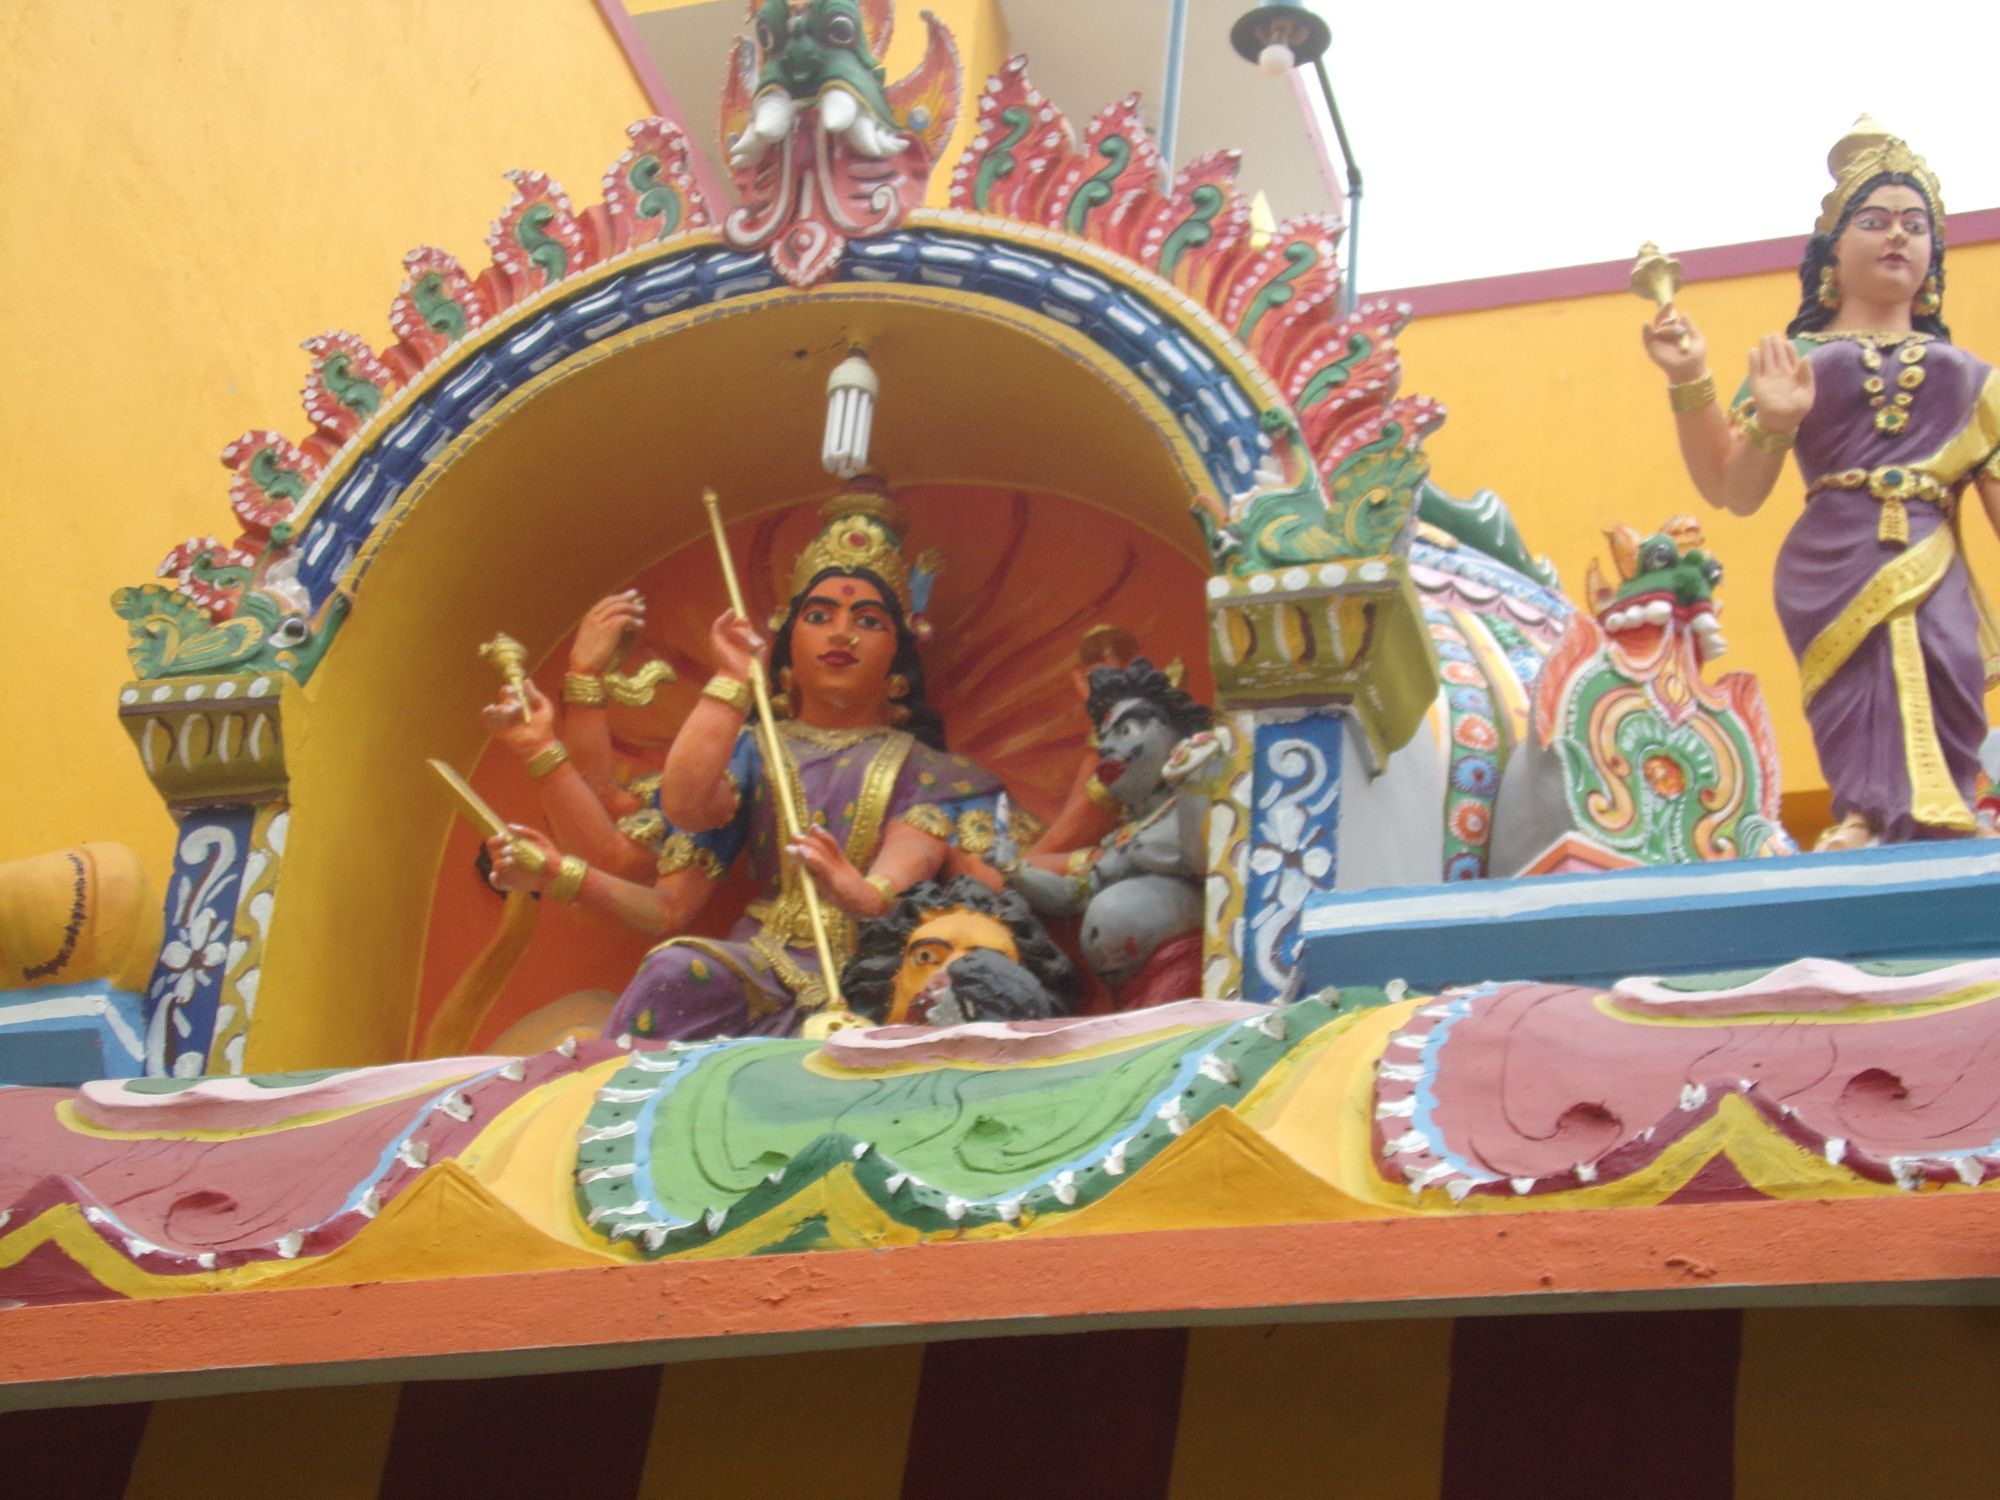 temple quartier tamoul dicinite decouverte pondy